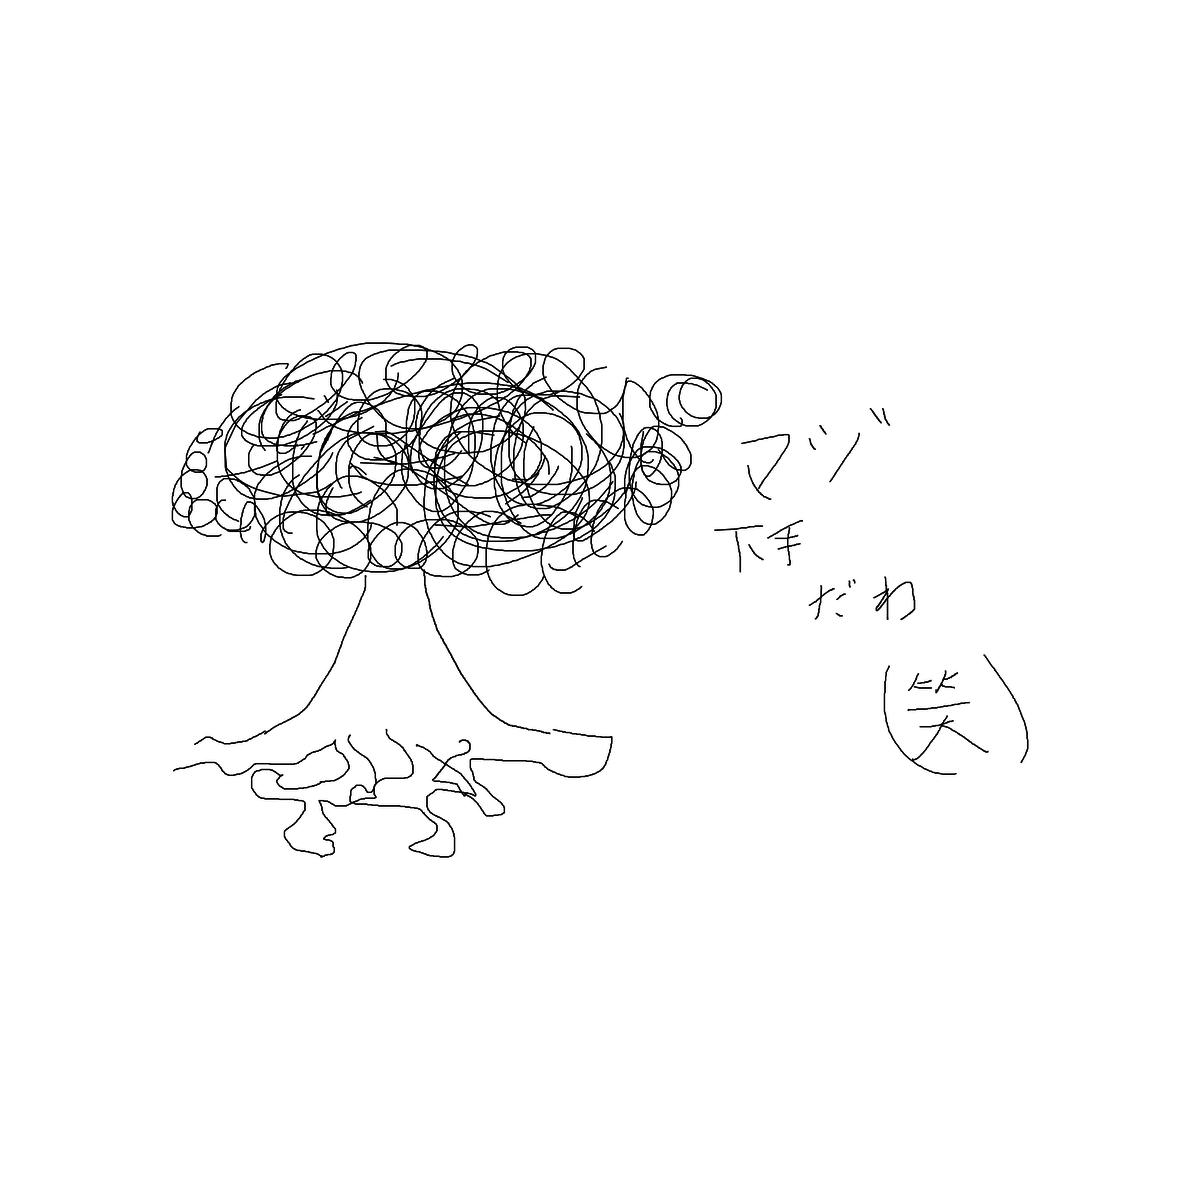 BAAAM drawing#22696 lat:52.4772453308105500lng: 13.4060173034667970